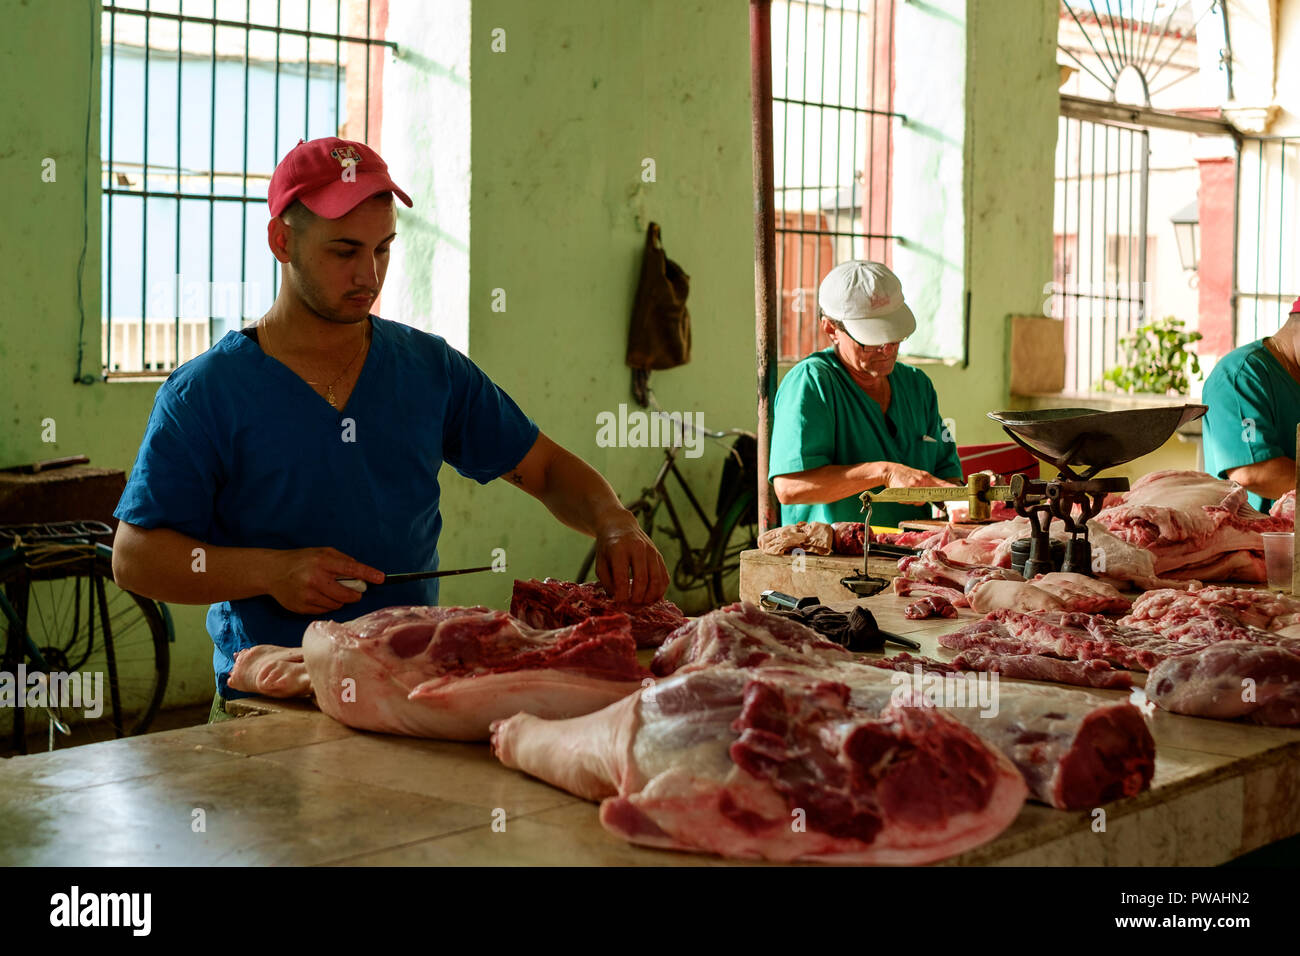 Meat Preparation in a Market in Sancti Spiritus, Cuba - Stock Image